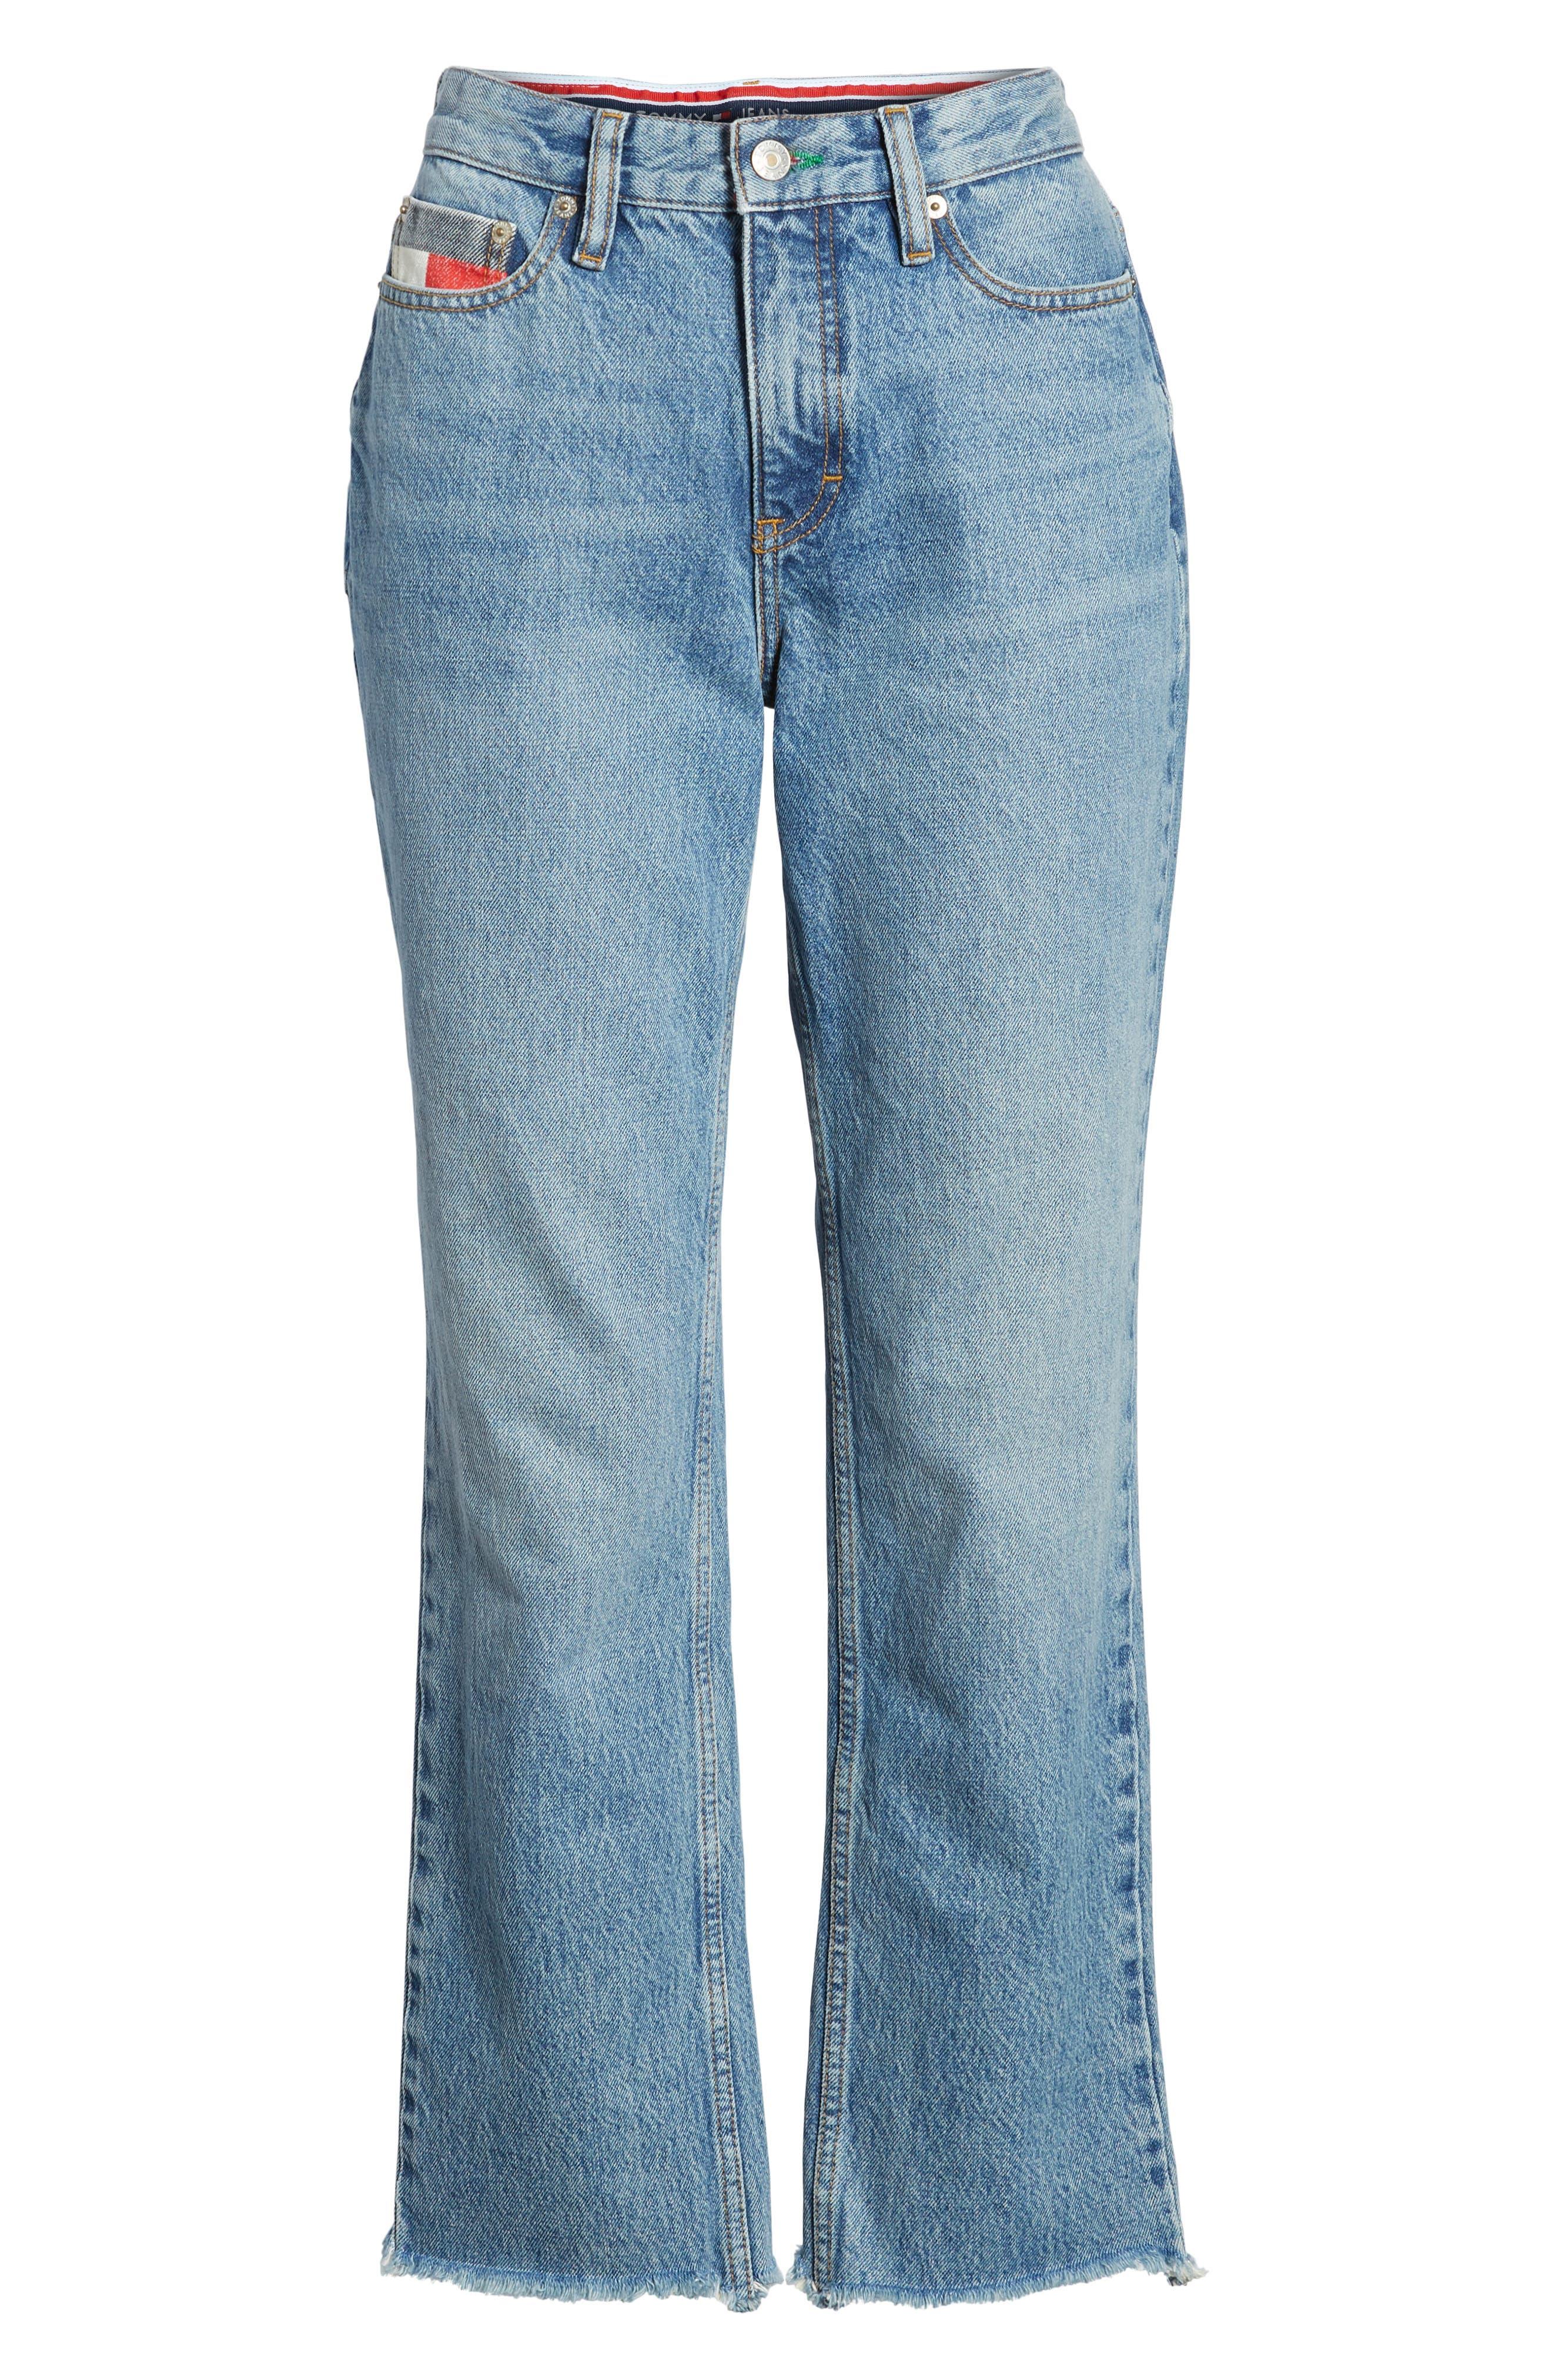 TJW 90s Mom Jeans,                             Alternate thumbnail 8, color,                             Mid Blue Denim